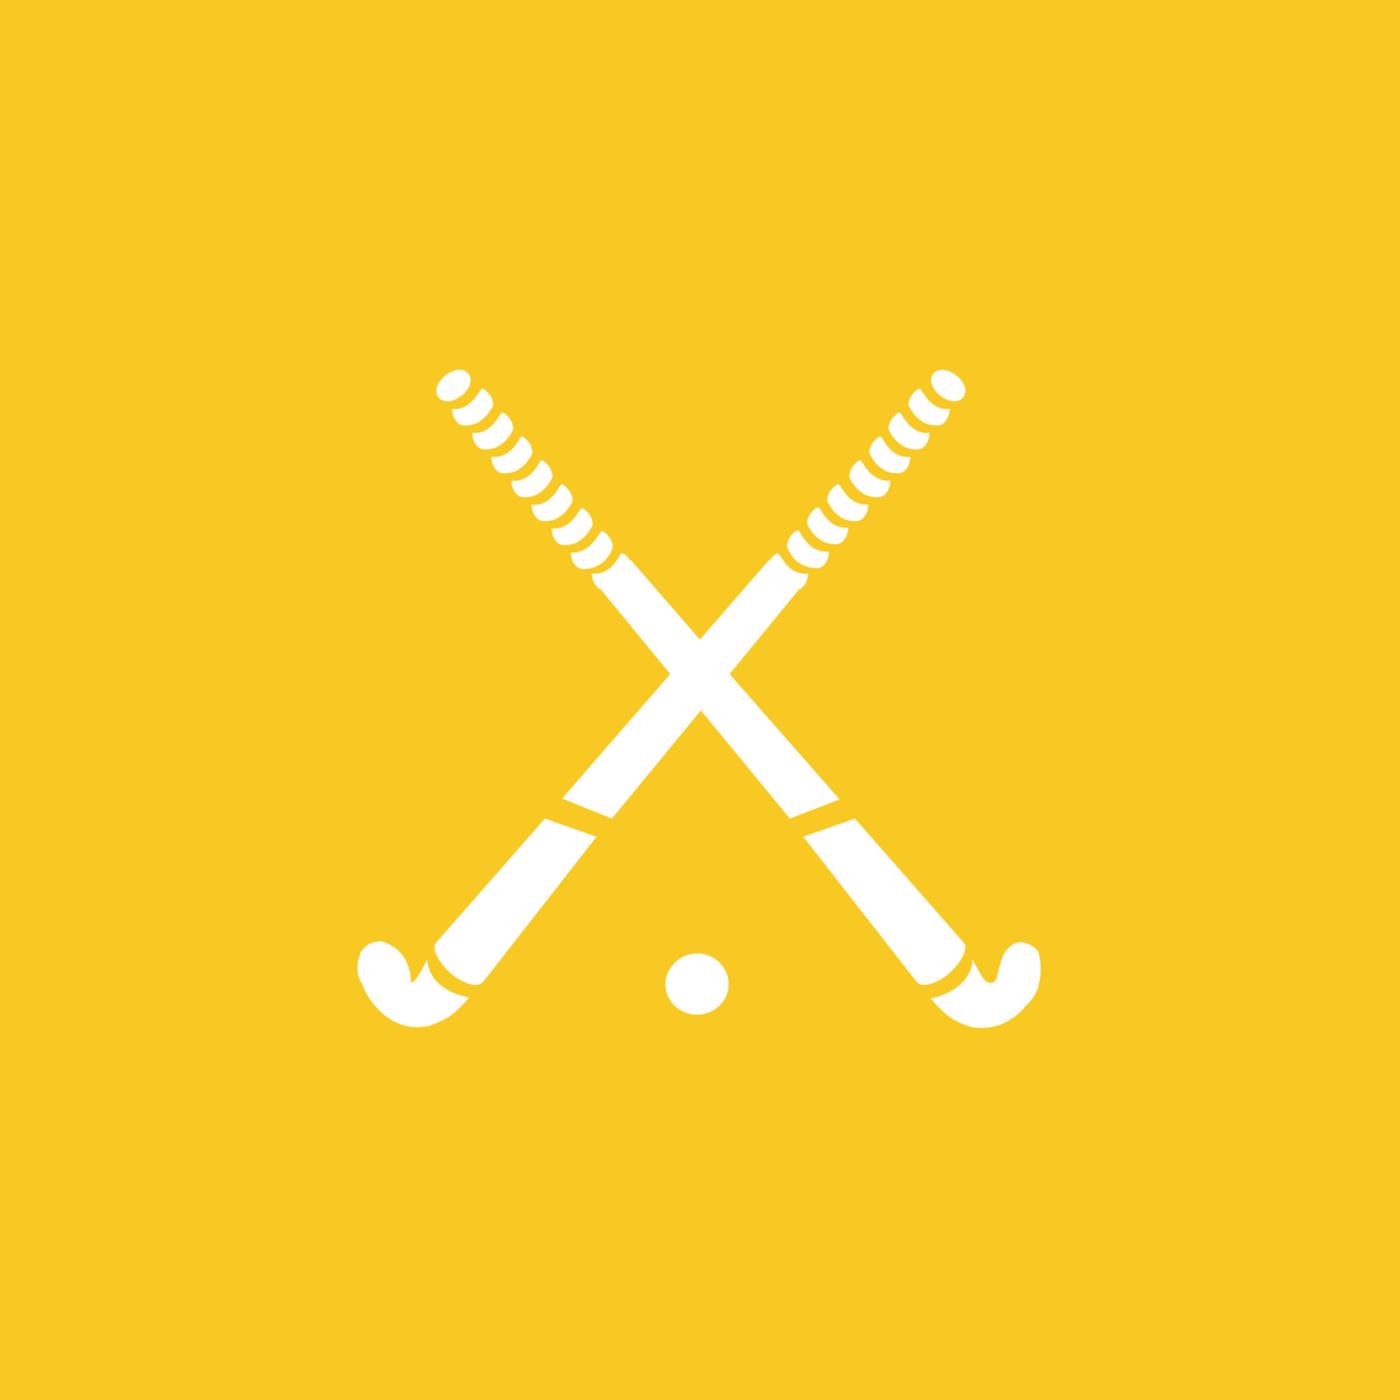 Change Hockey